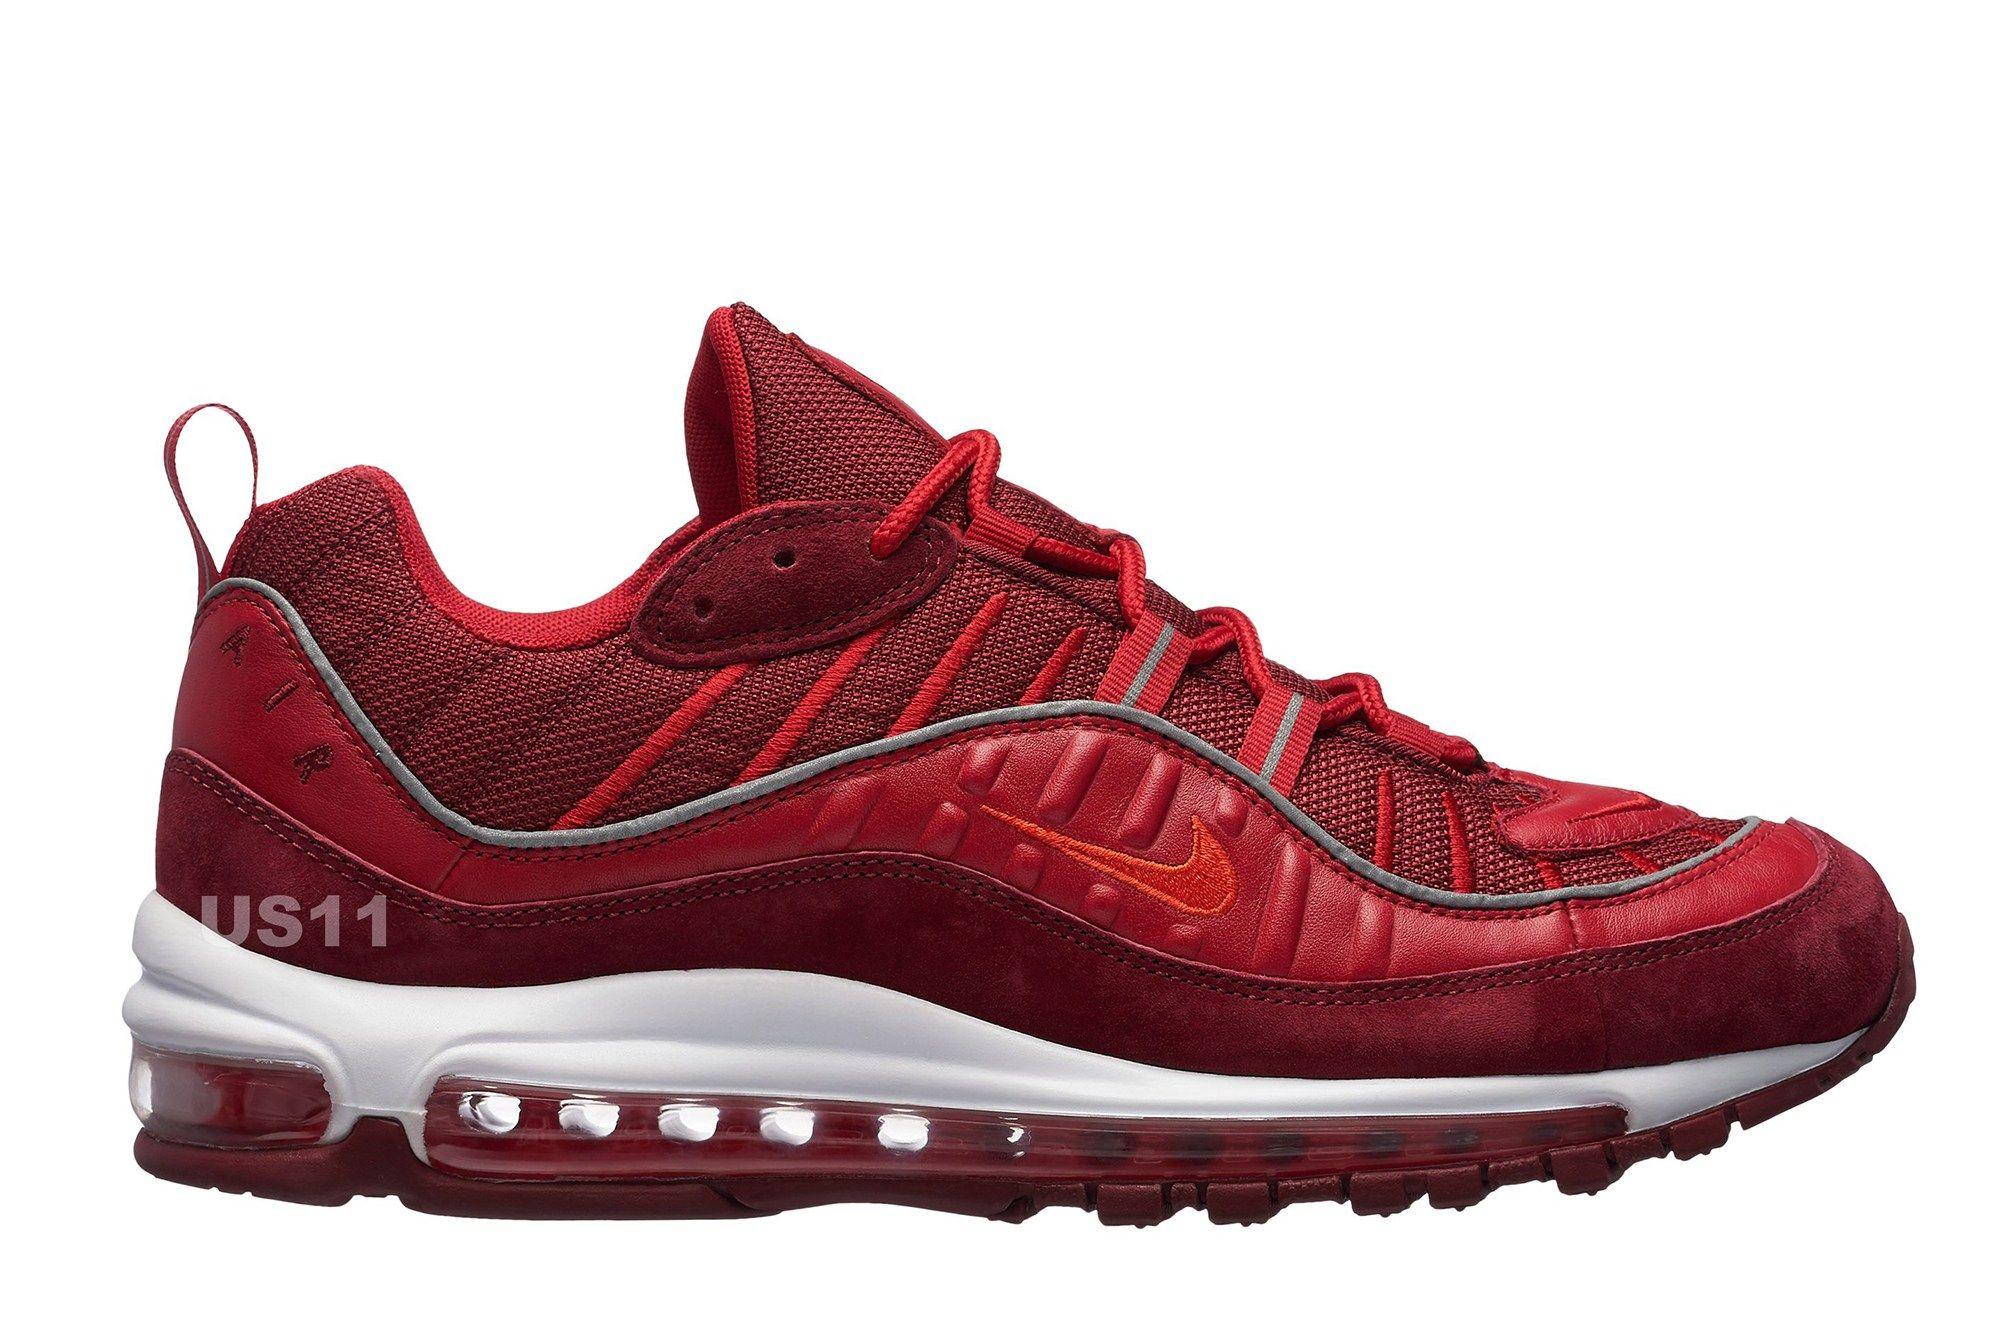 Nike Air Max 98 SE: Three Colorway Preview - EU Kicks: Sneaker Magazine